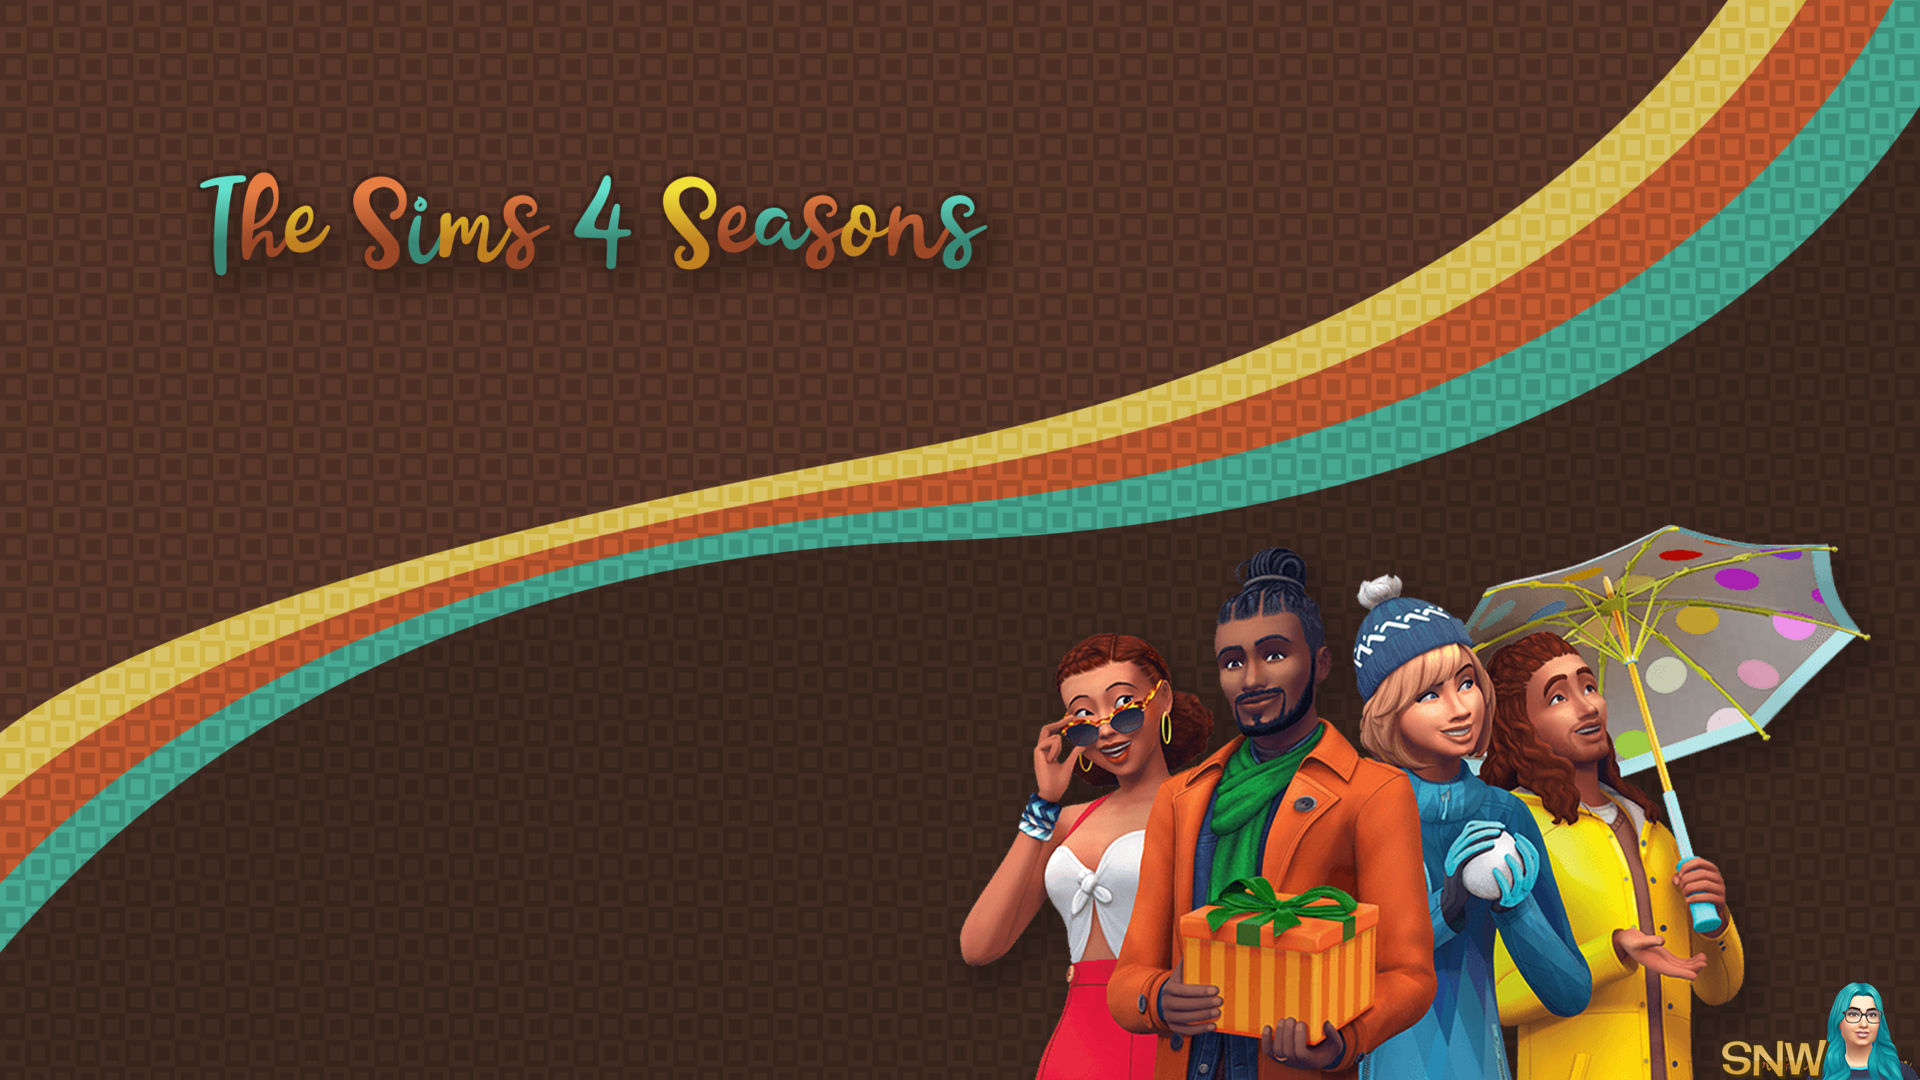 The Sims 4 Seasons Game Official Desktop Wallpaper 2160423 Hd